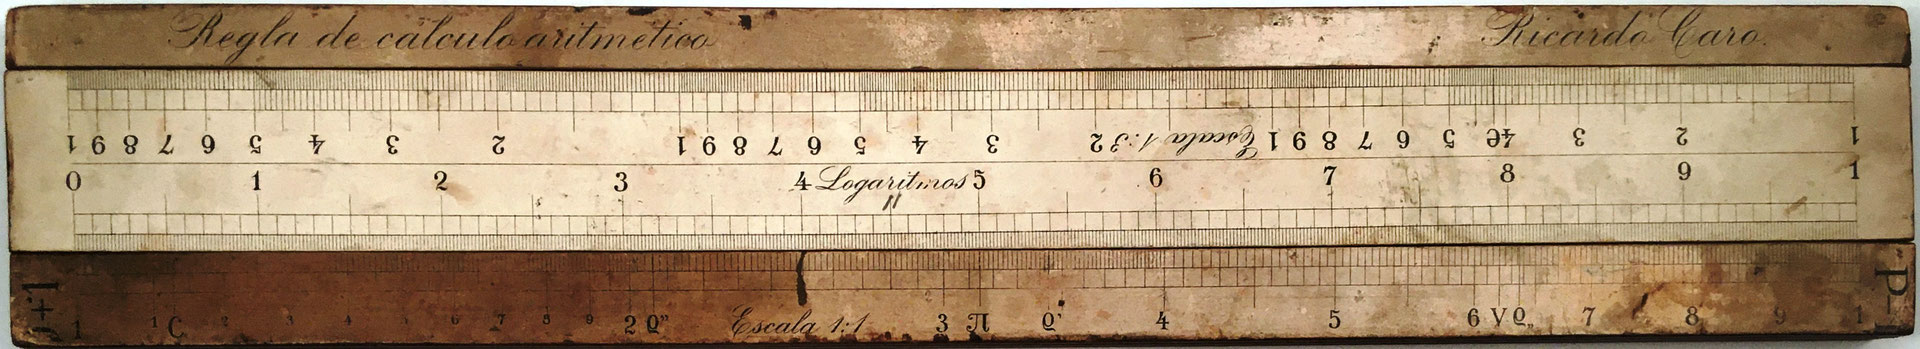 Regla de cálculo aritmético R. CARO, escala logaritmos frente a la escala 1:1 (números)